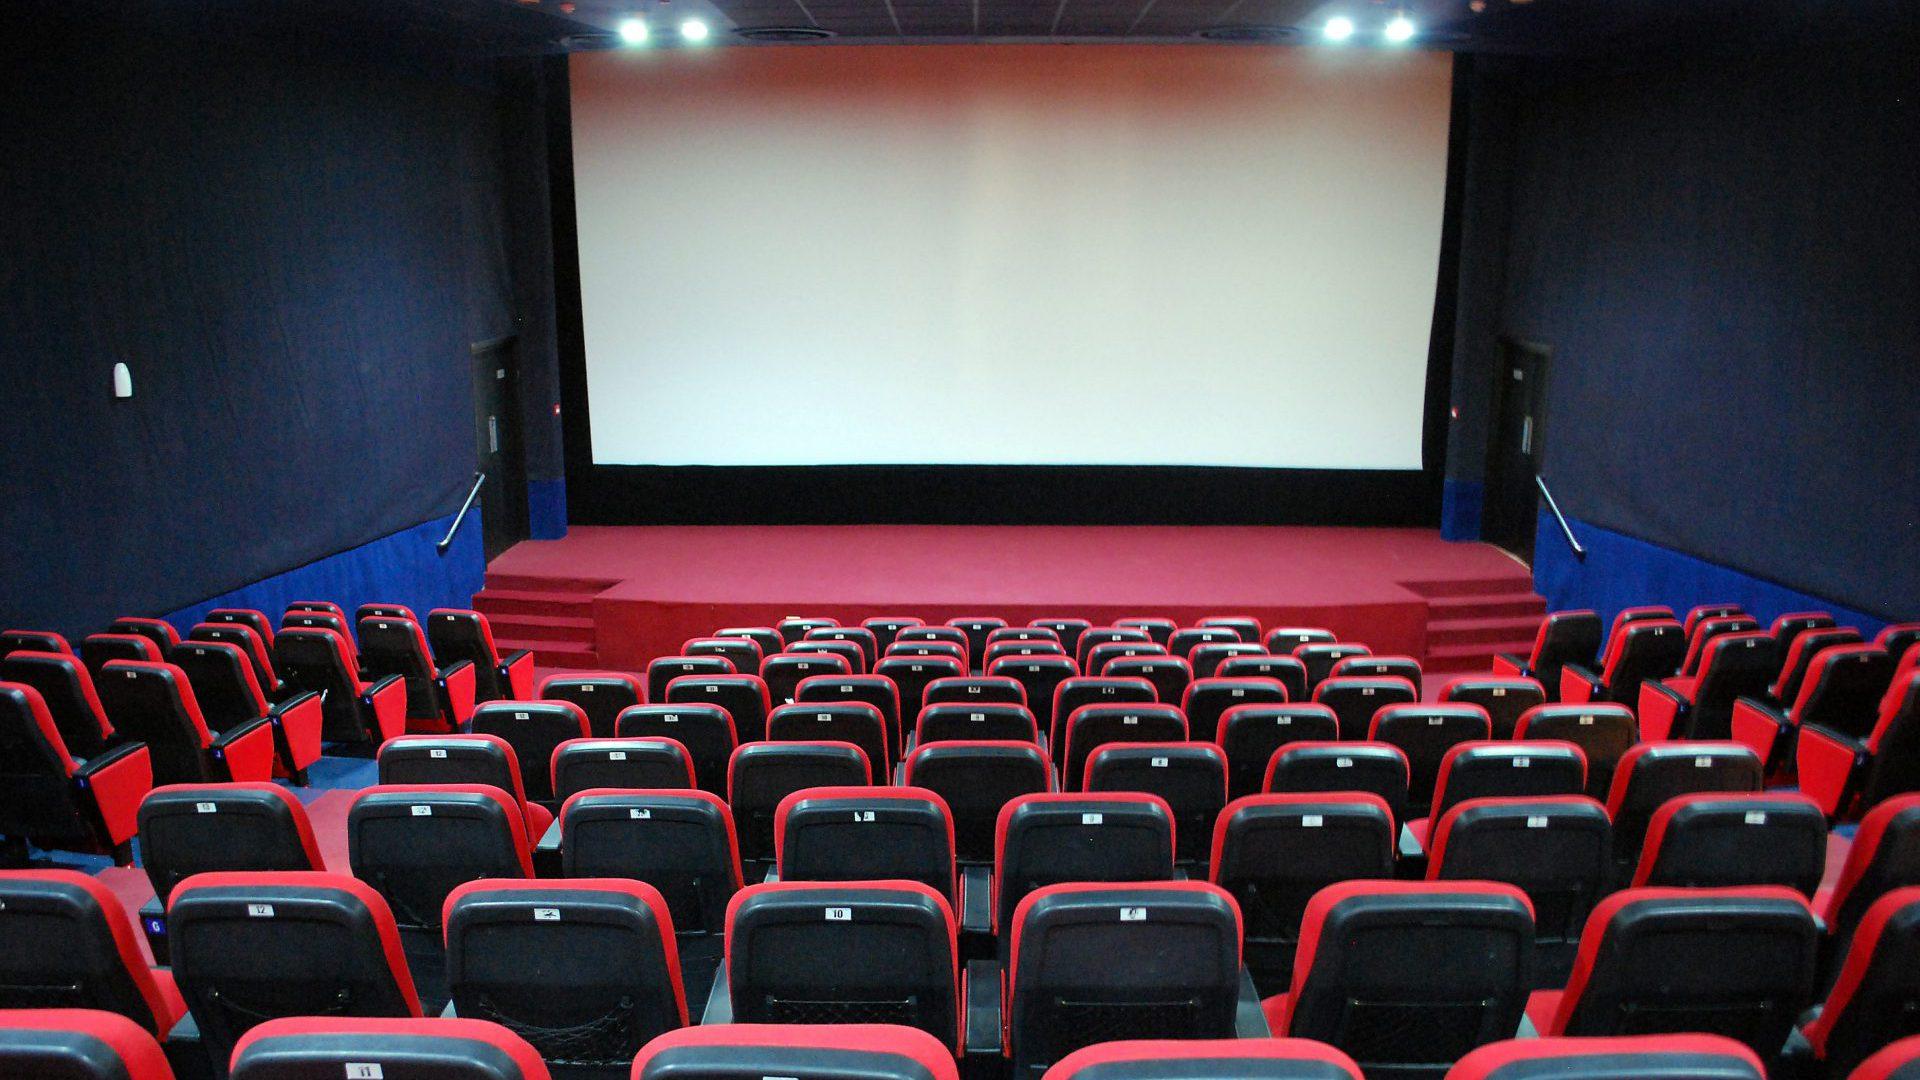 Saudi Arabia lifts 35-year ban on movietheaters